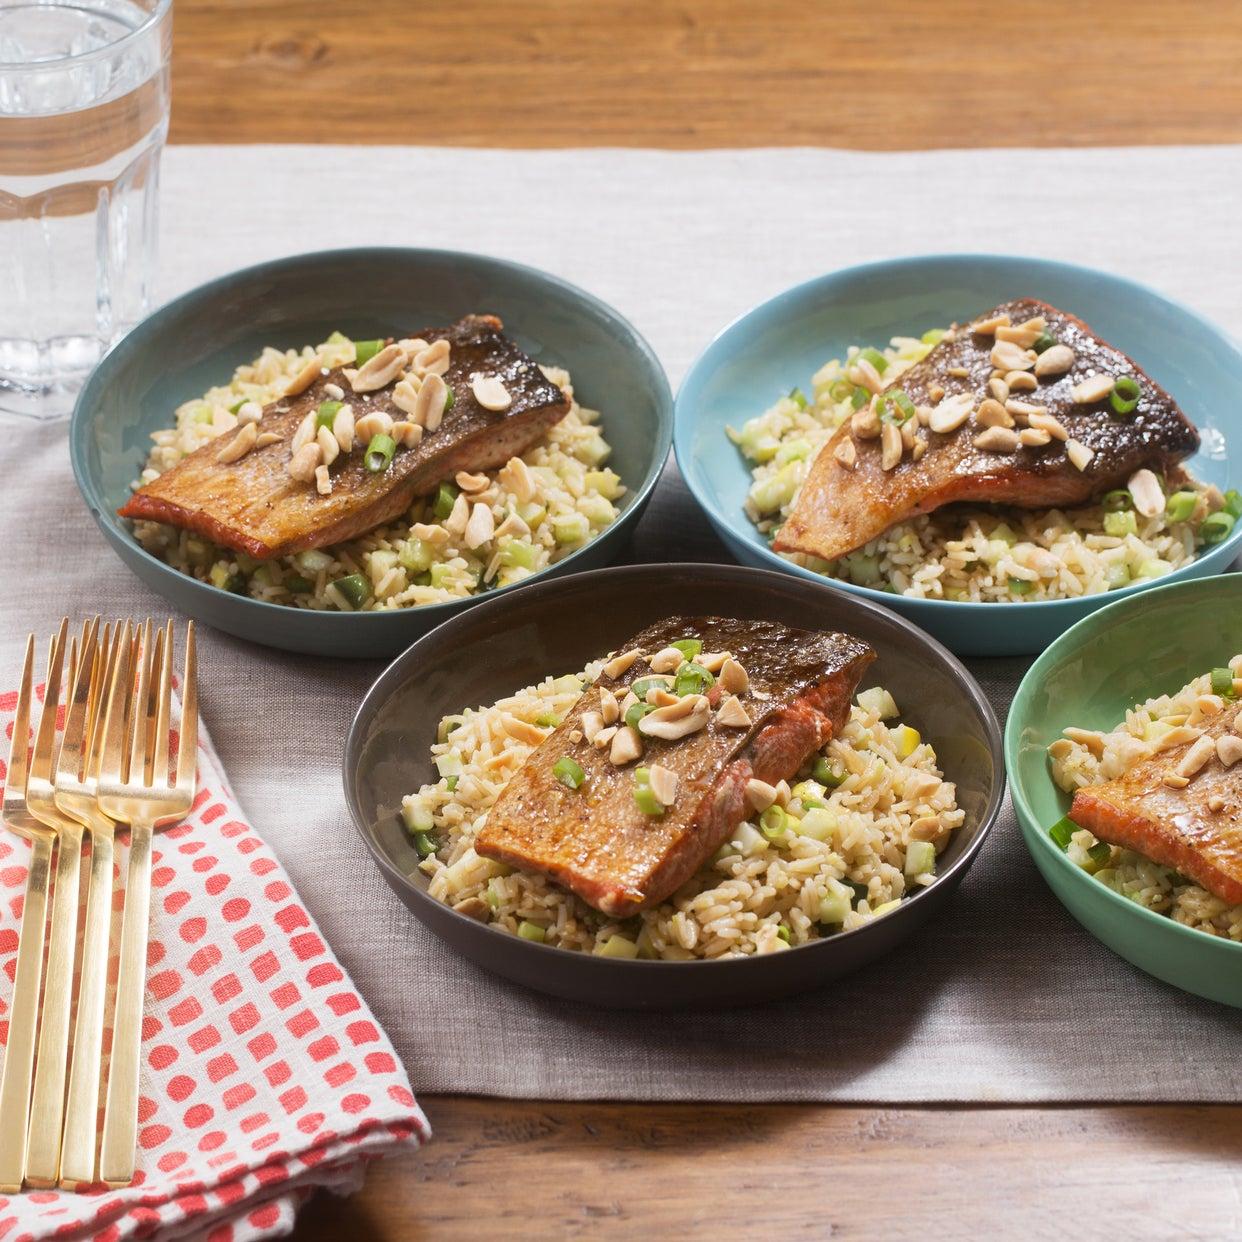 Teriyaki-Glazed Salmon with Brown Rice, Bell Pepper & Cucumber